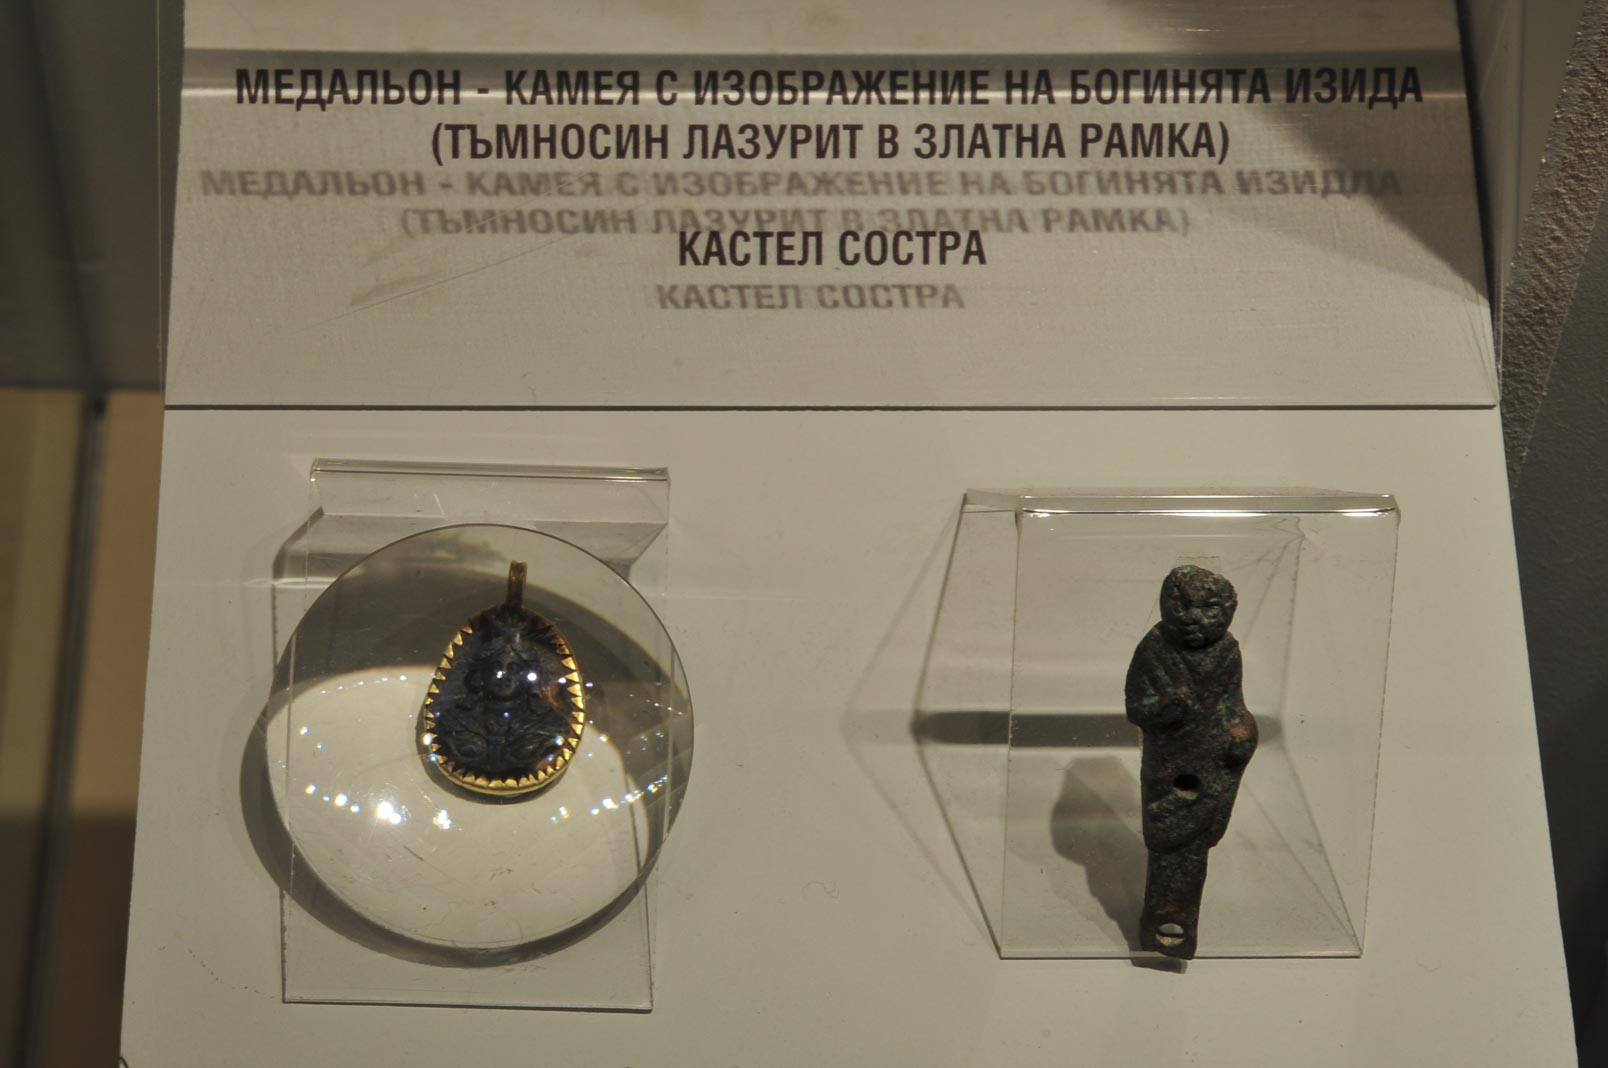 troyan-museum-arheologichesko-nasledstvo-19